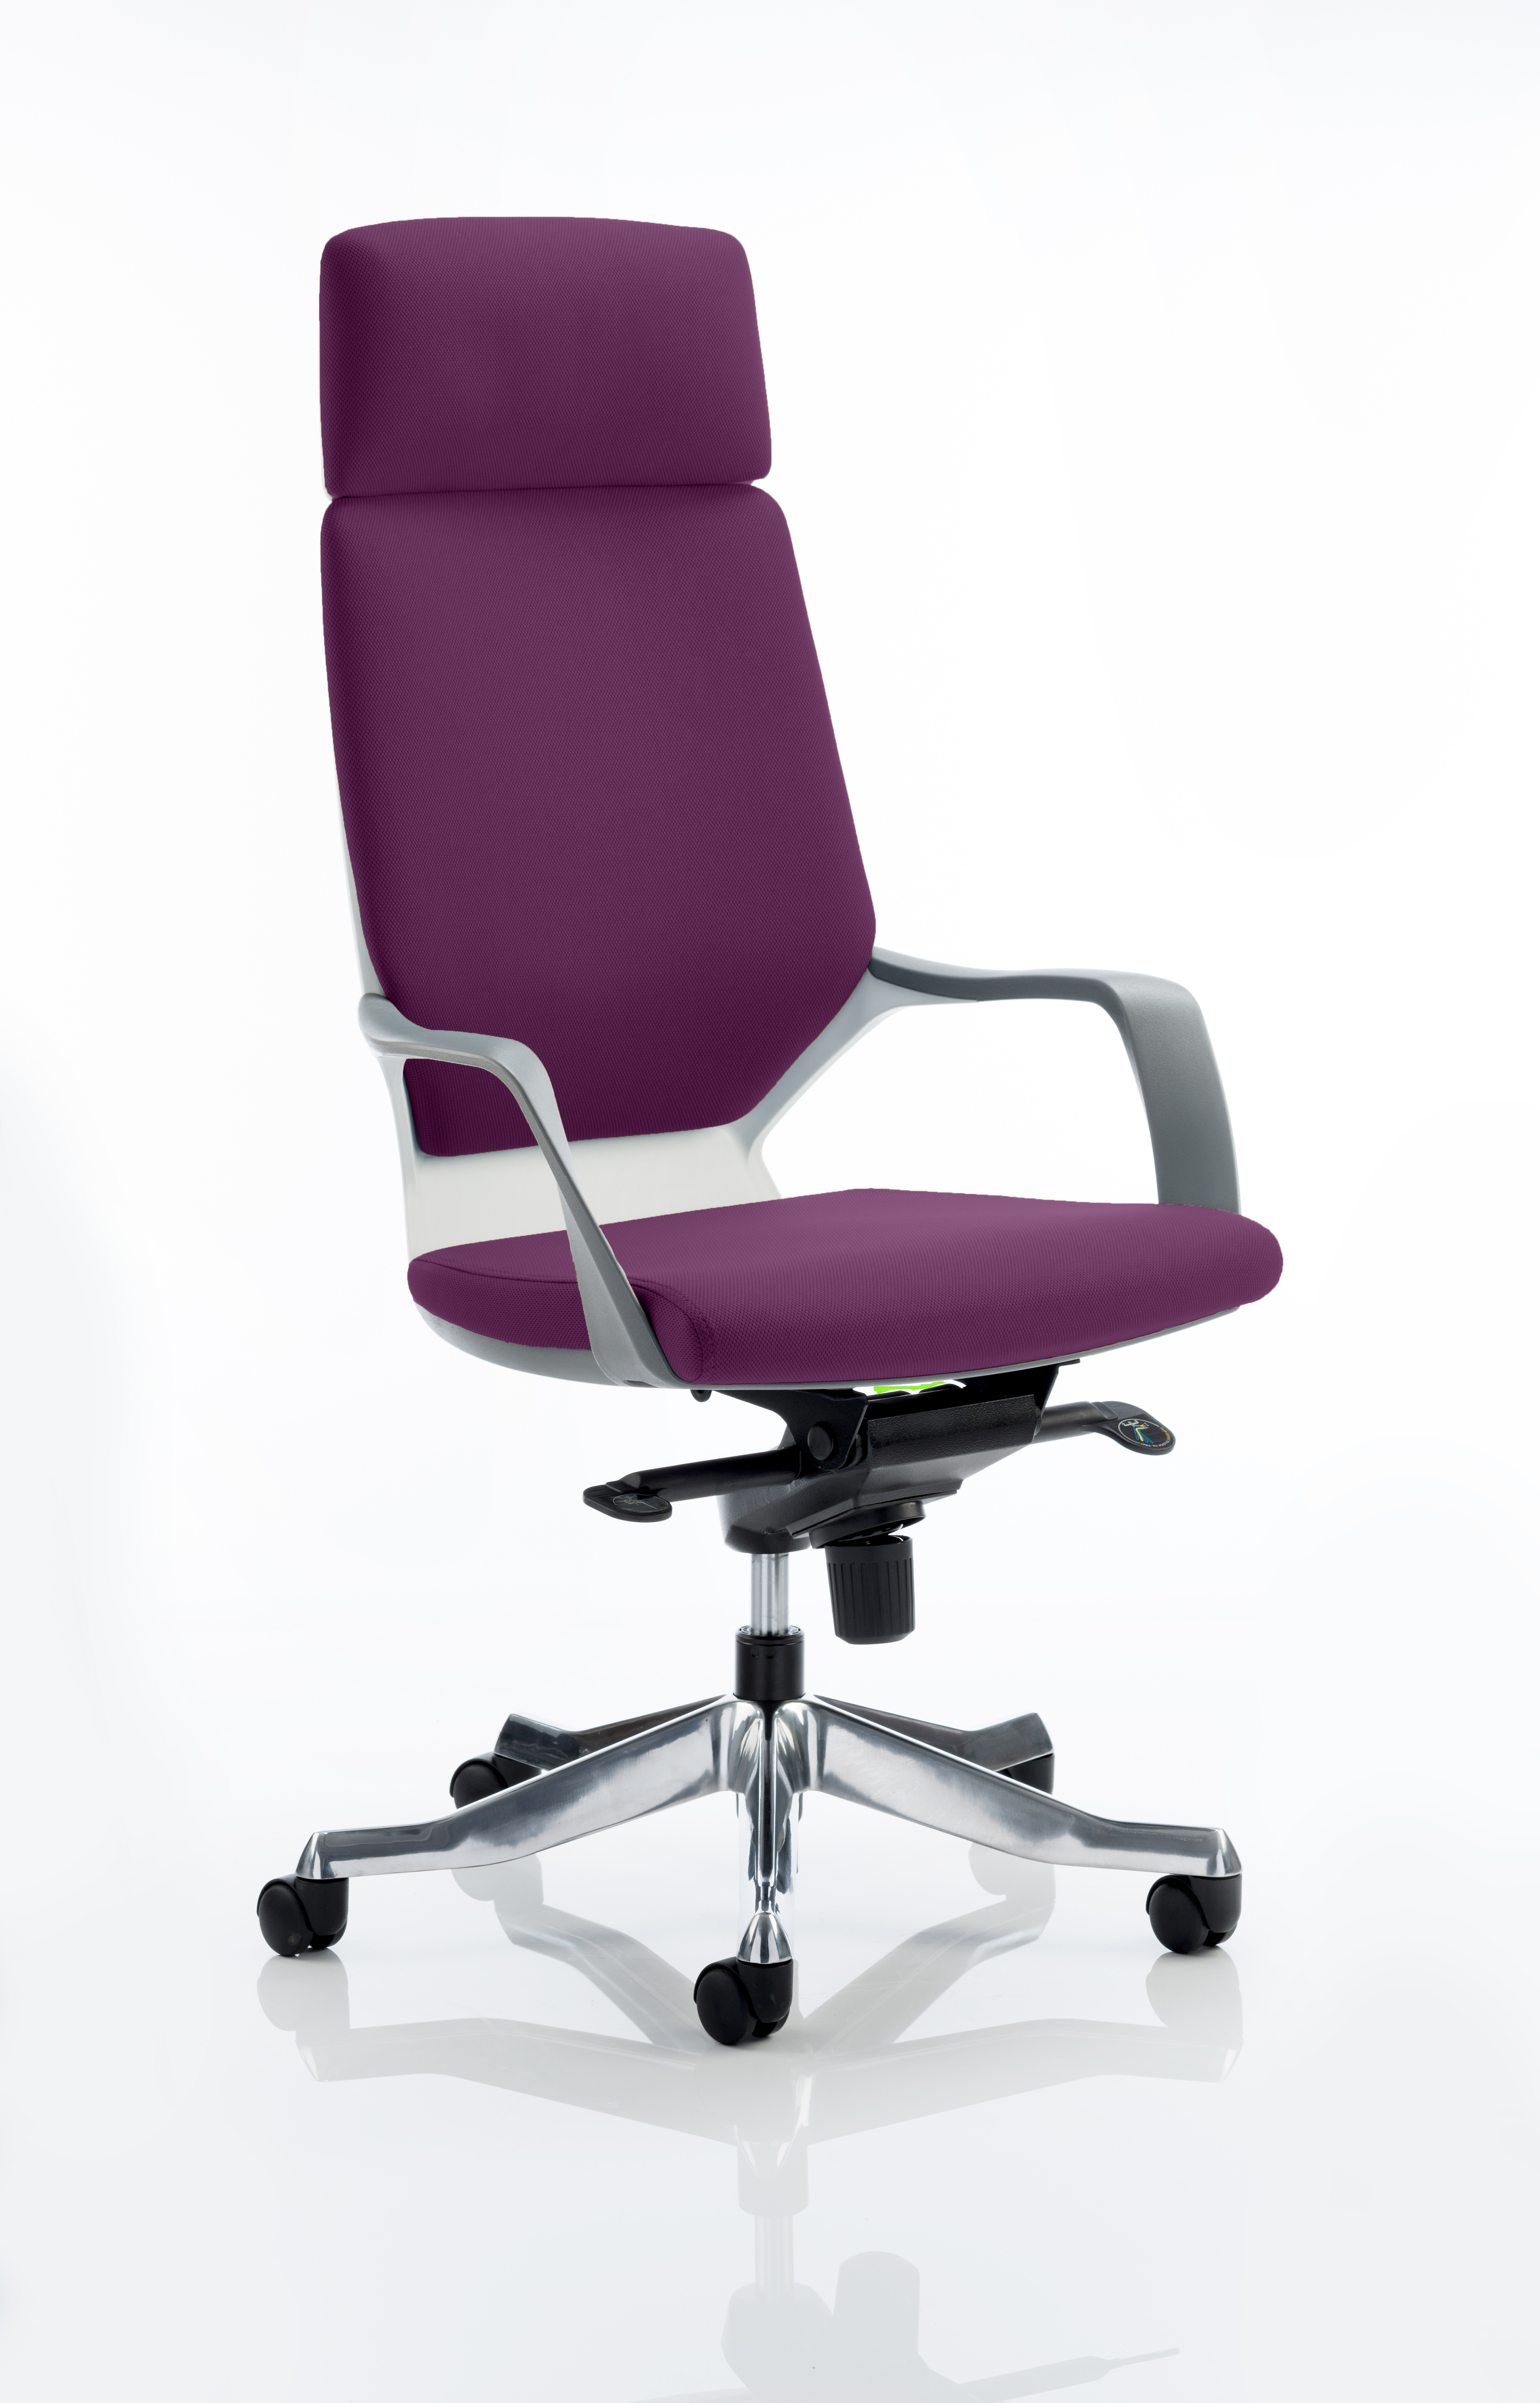 Xenon Headrest White Shell Bespoke Colour Tansy Purple